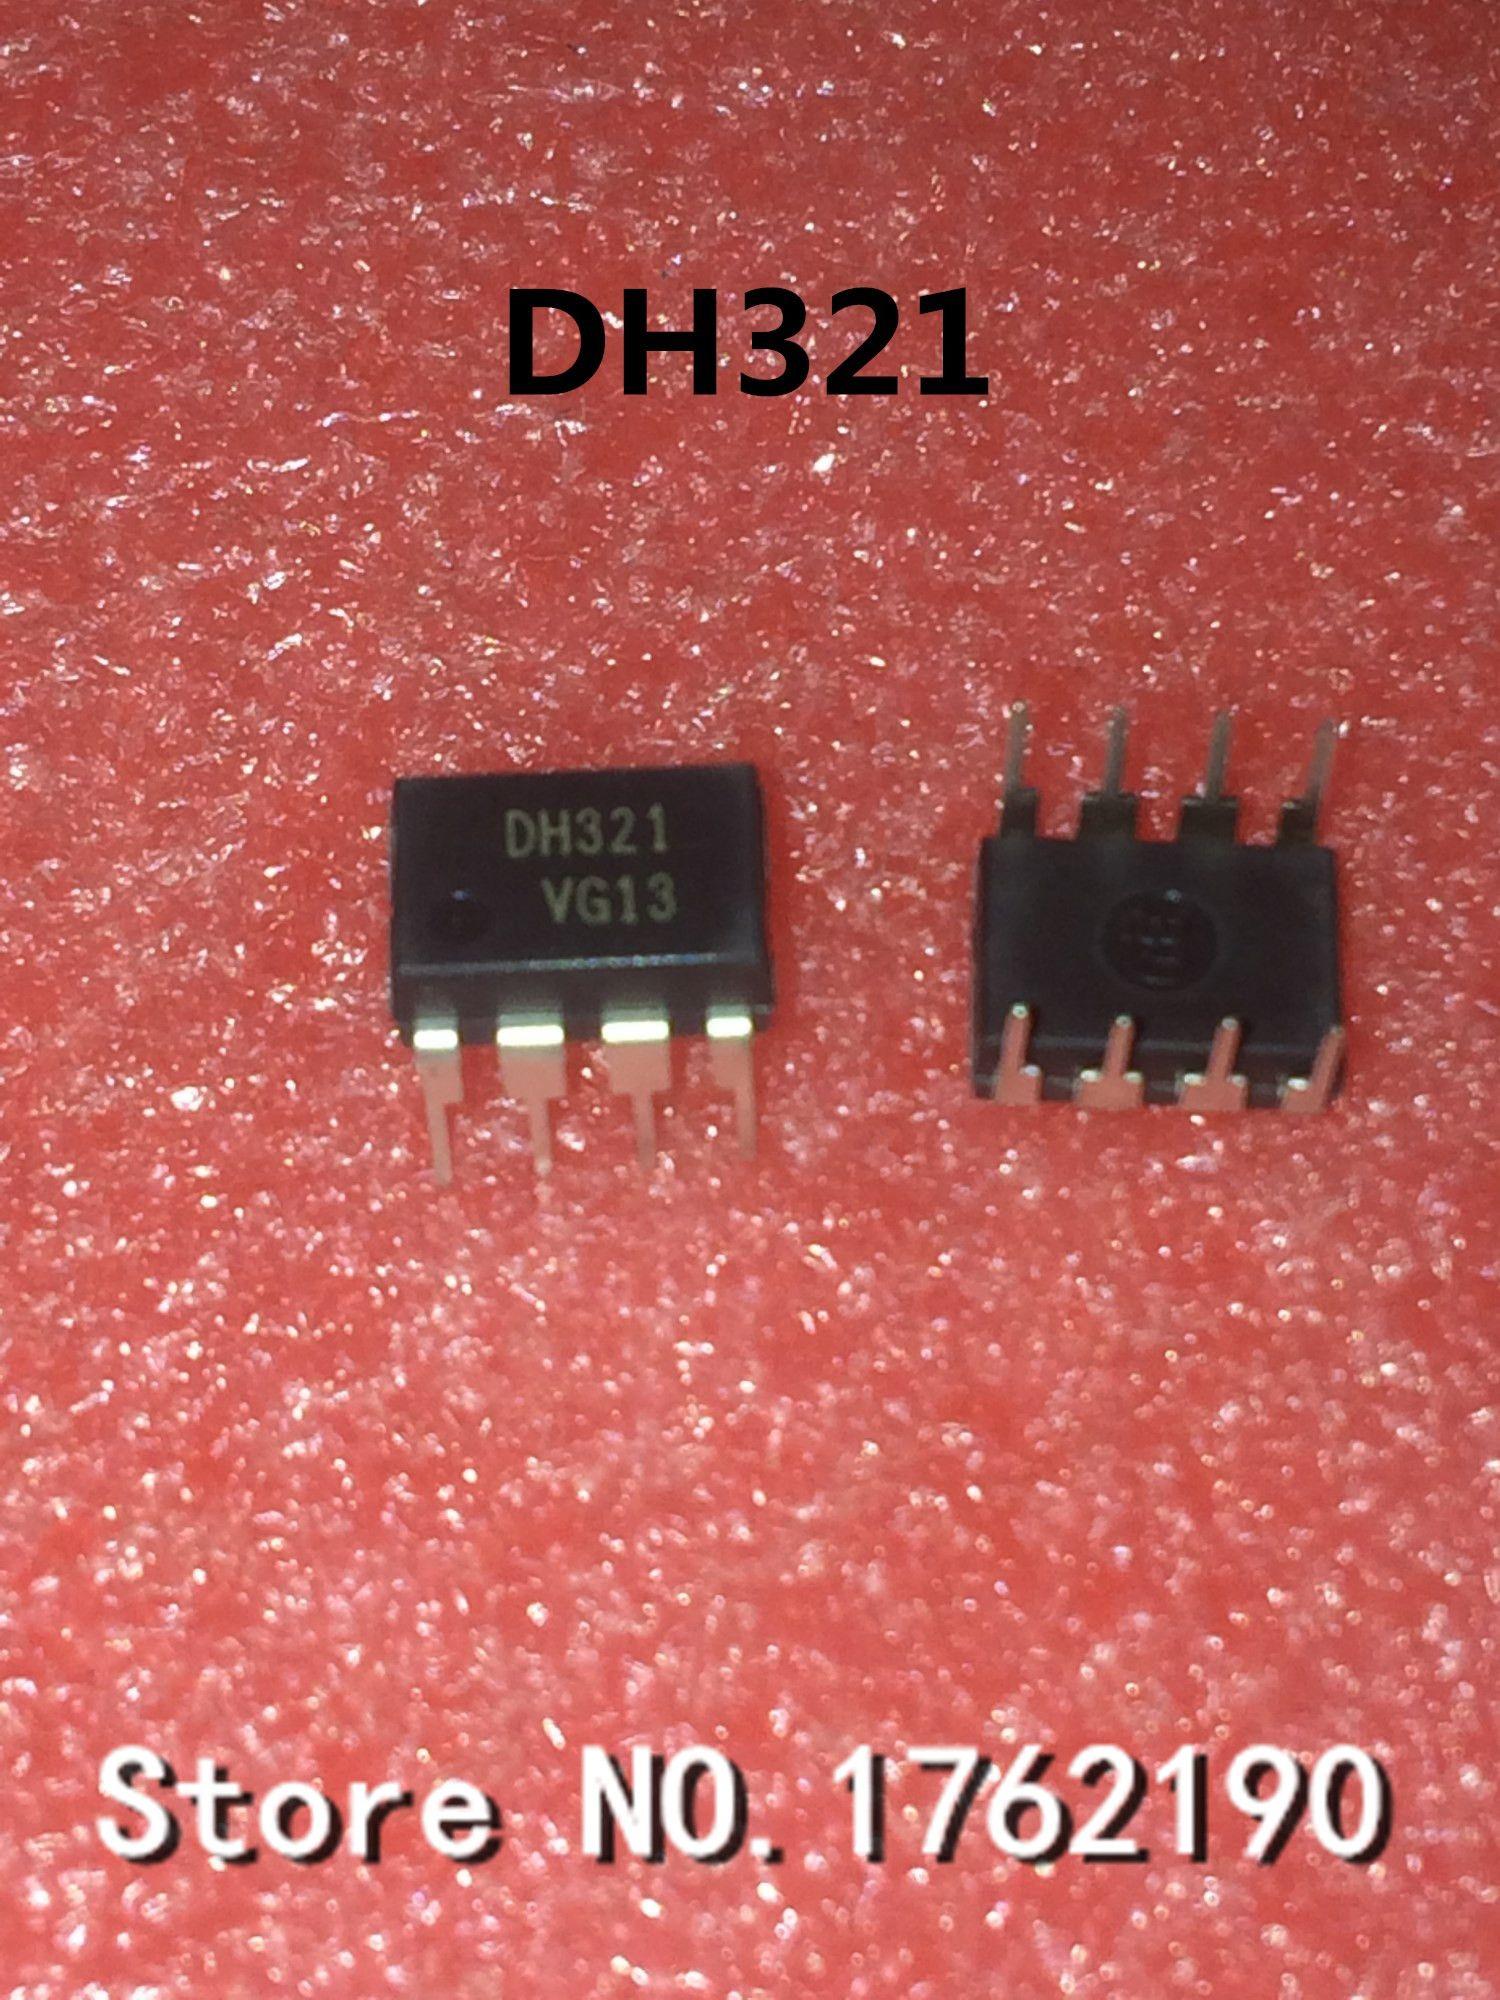 100pcs Lot Dh321 Cooker Power Management Chip 08 Dip 8 Induction Circuit Diagram Of